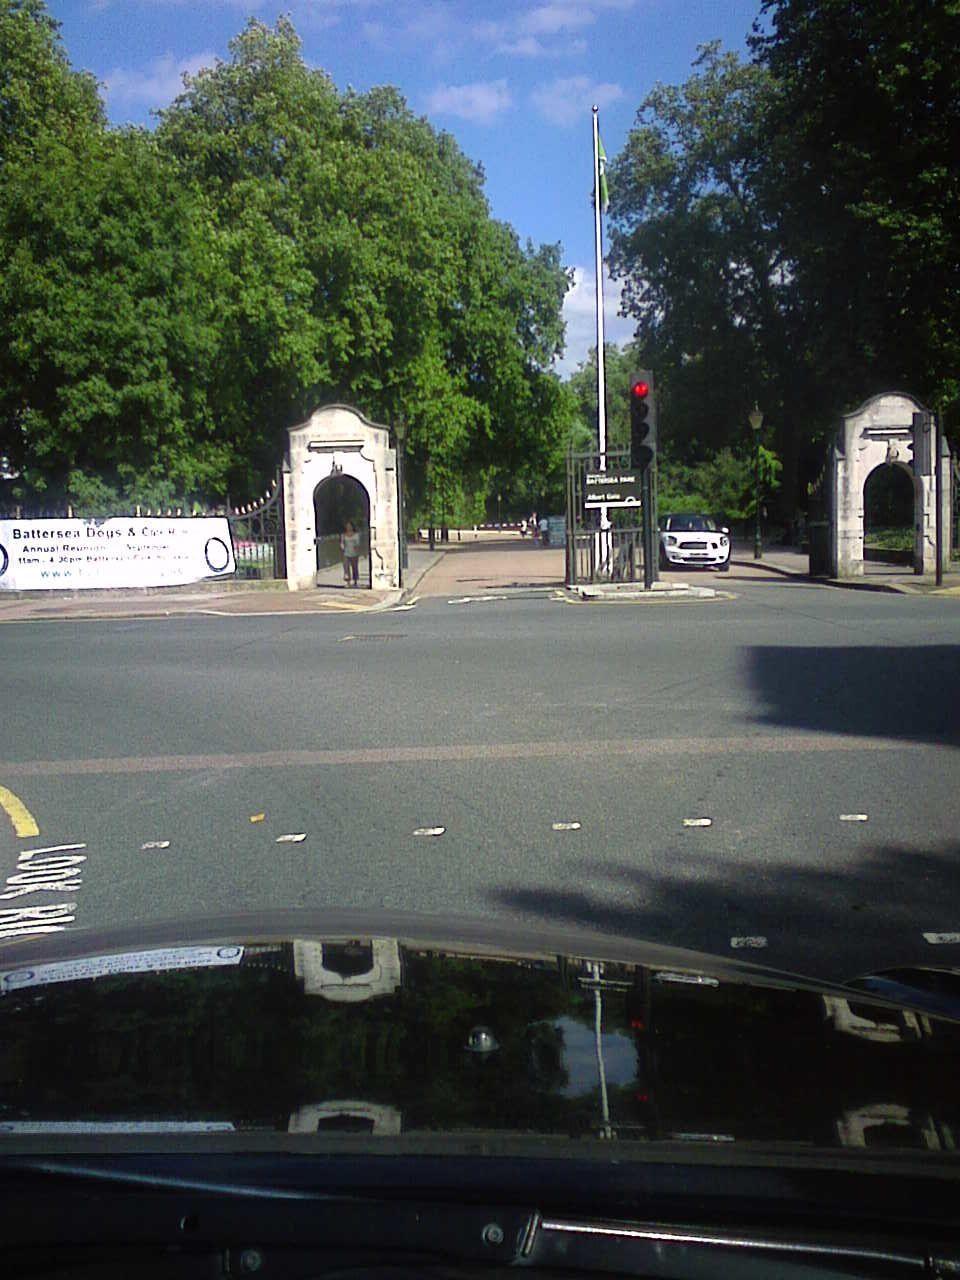 Battersea Park, Albert Bridge Road side.